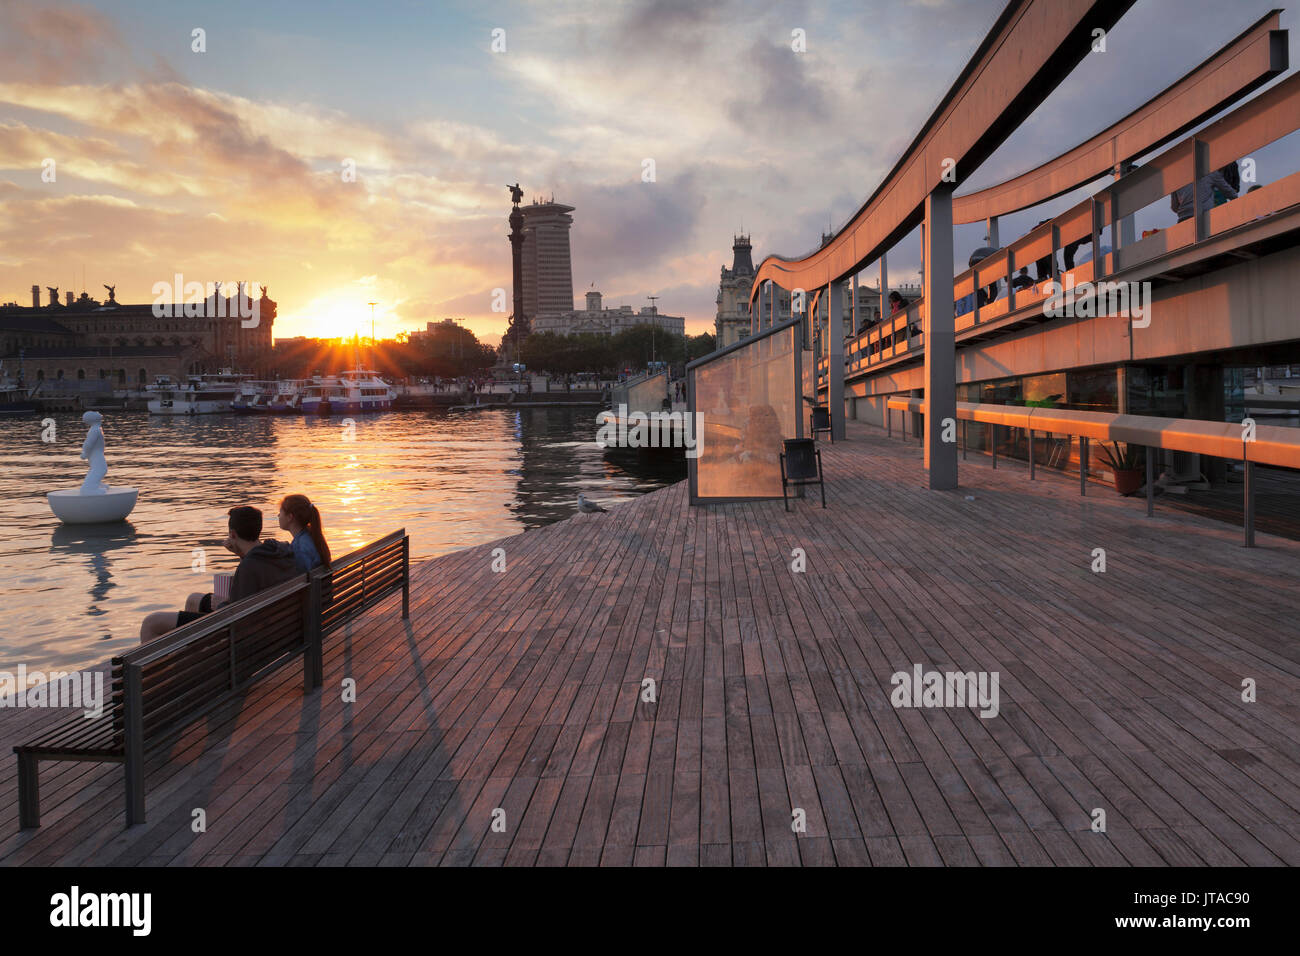 Rambla del Mar, Port Vell, Edificio Doppelpunkt Turm und das Kolumbus Denkmal (Monument a Colom), Barcelona, Katalonien, Spanien, Europa Stockbild